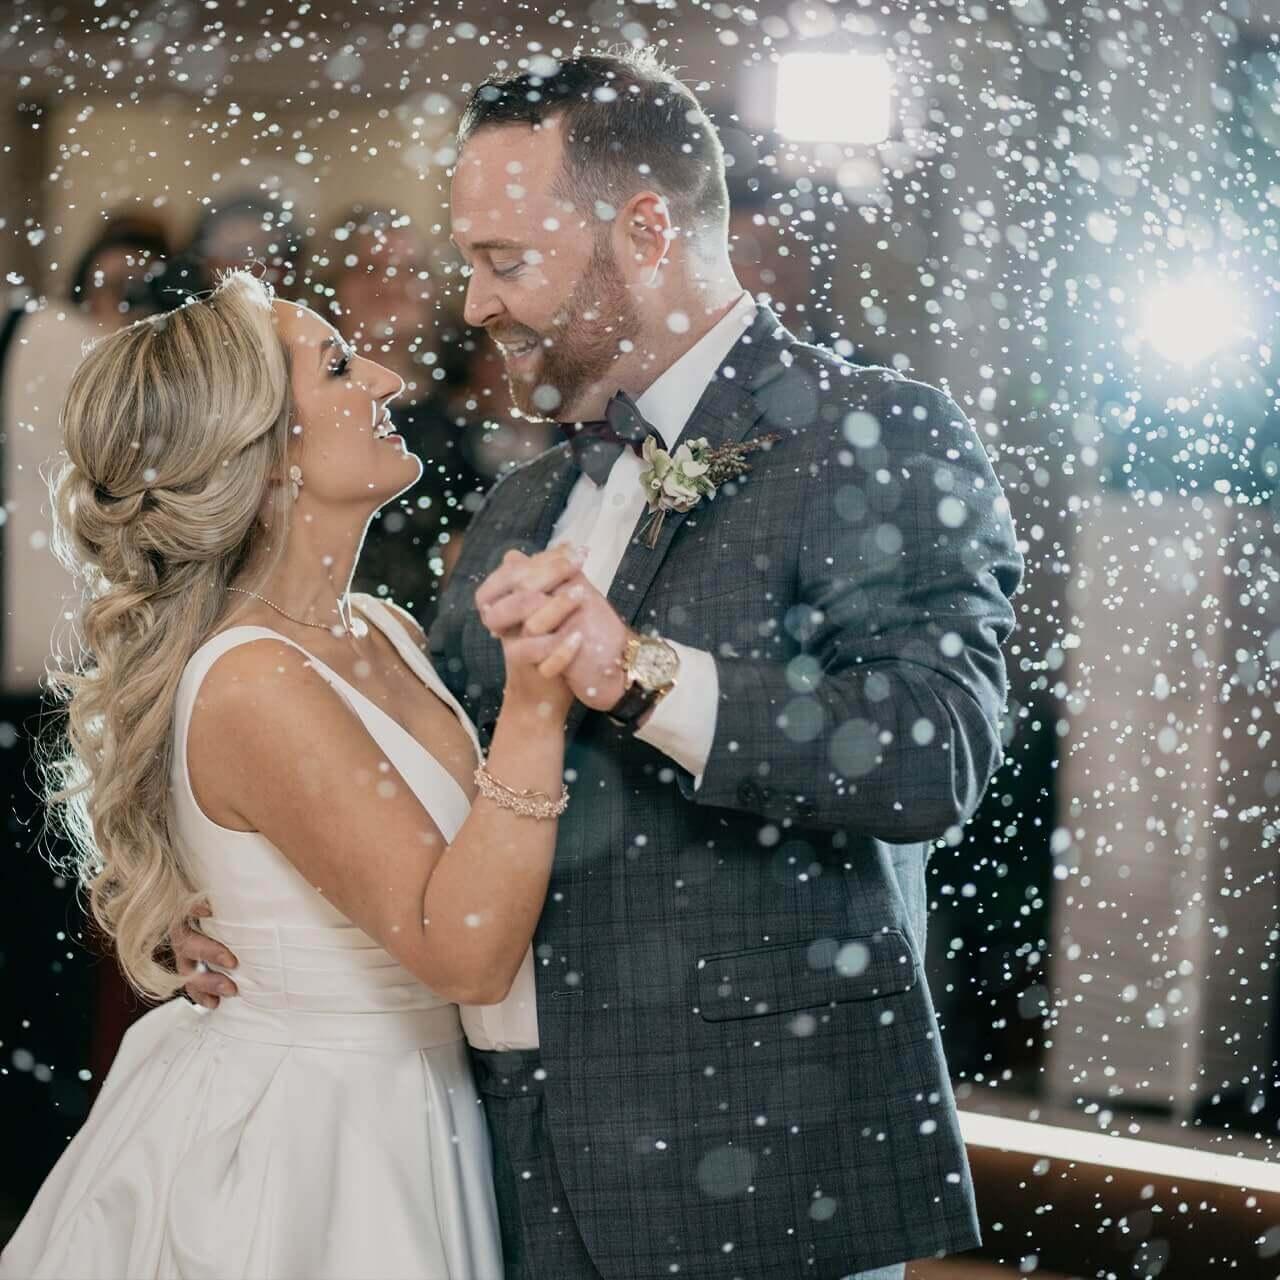 Snow at a wedding